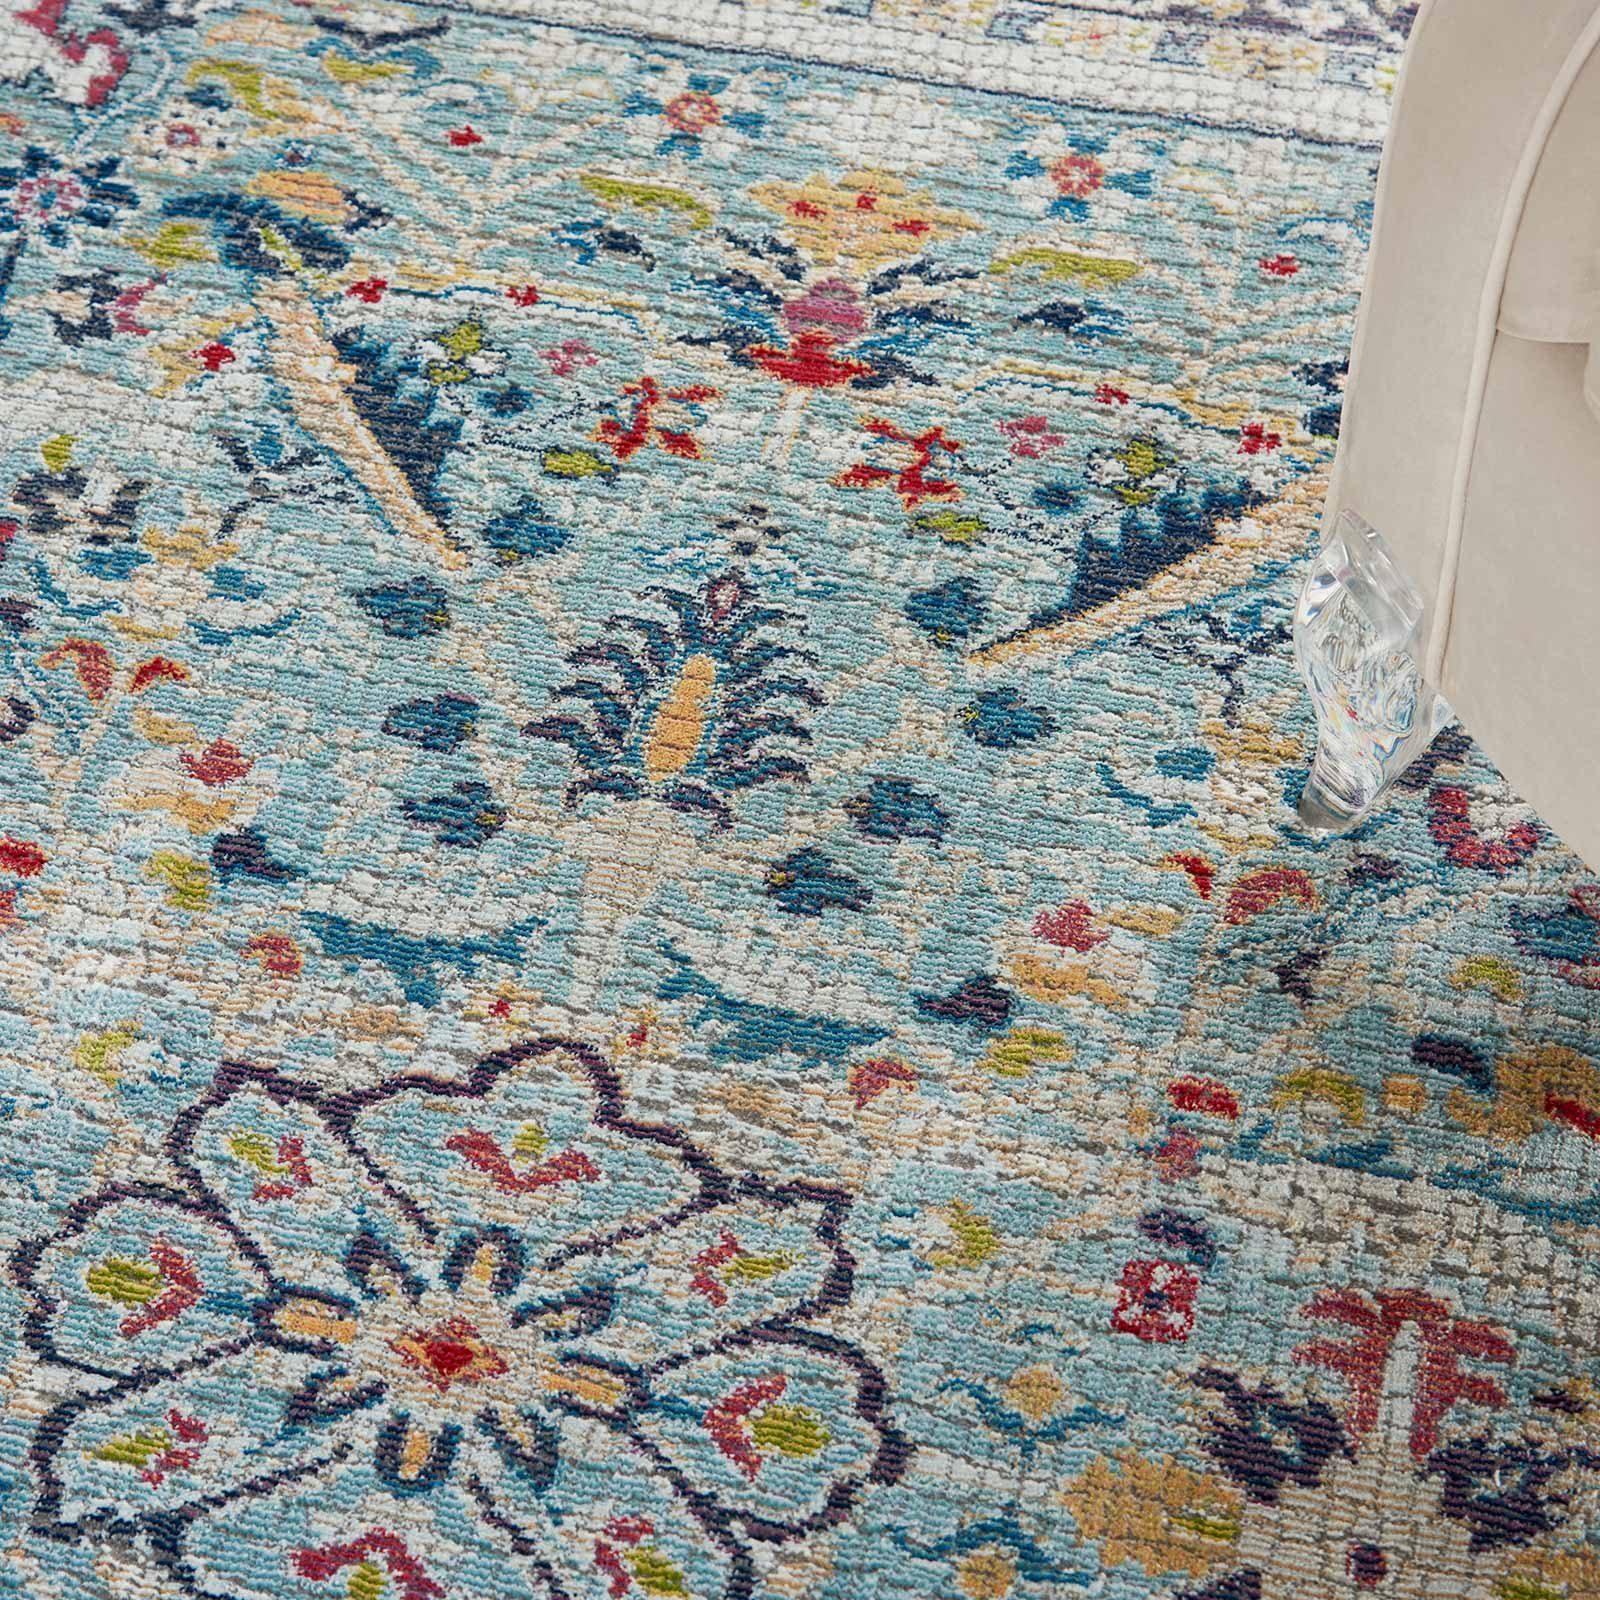 Nourison rug Ankara Global ANR14 TEAL MULTI 5X8 099446498441 interior 2 C